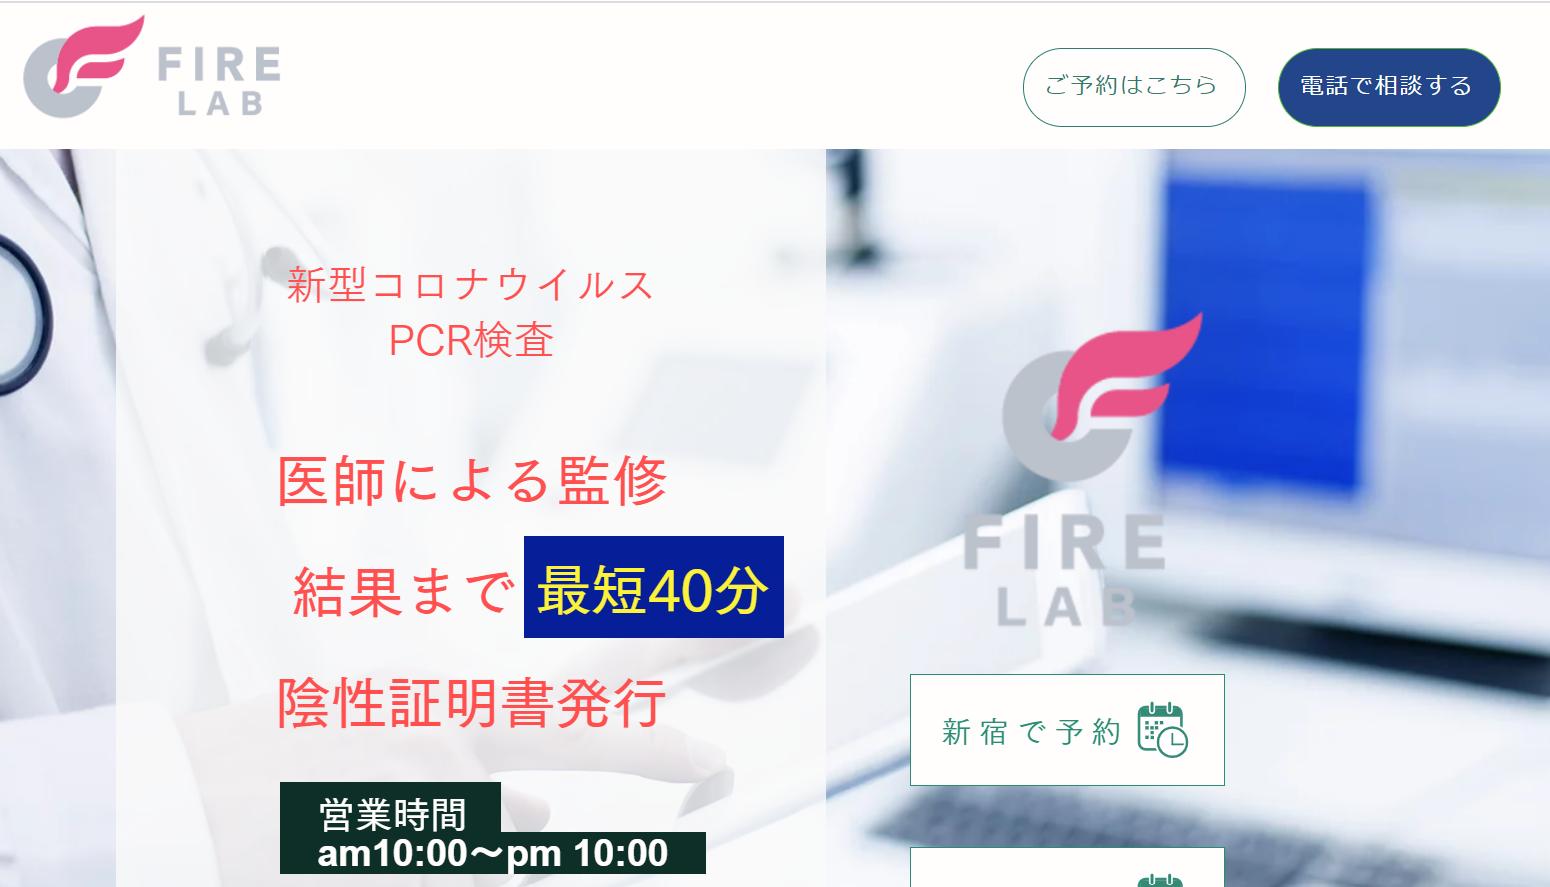 【GW診療可も】東京で即日対応できる、PCR検査会場まとめ!当日結果や夜間OK